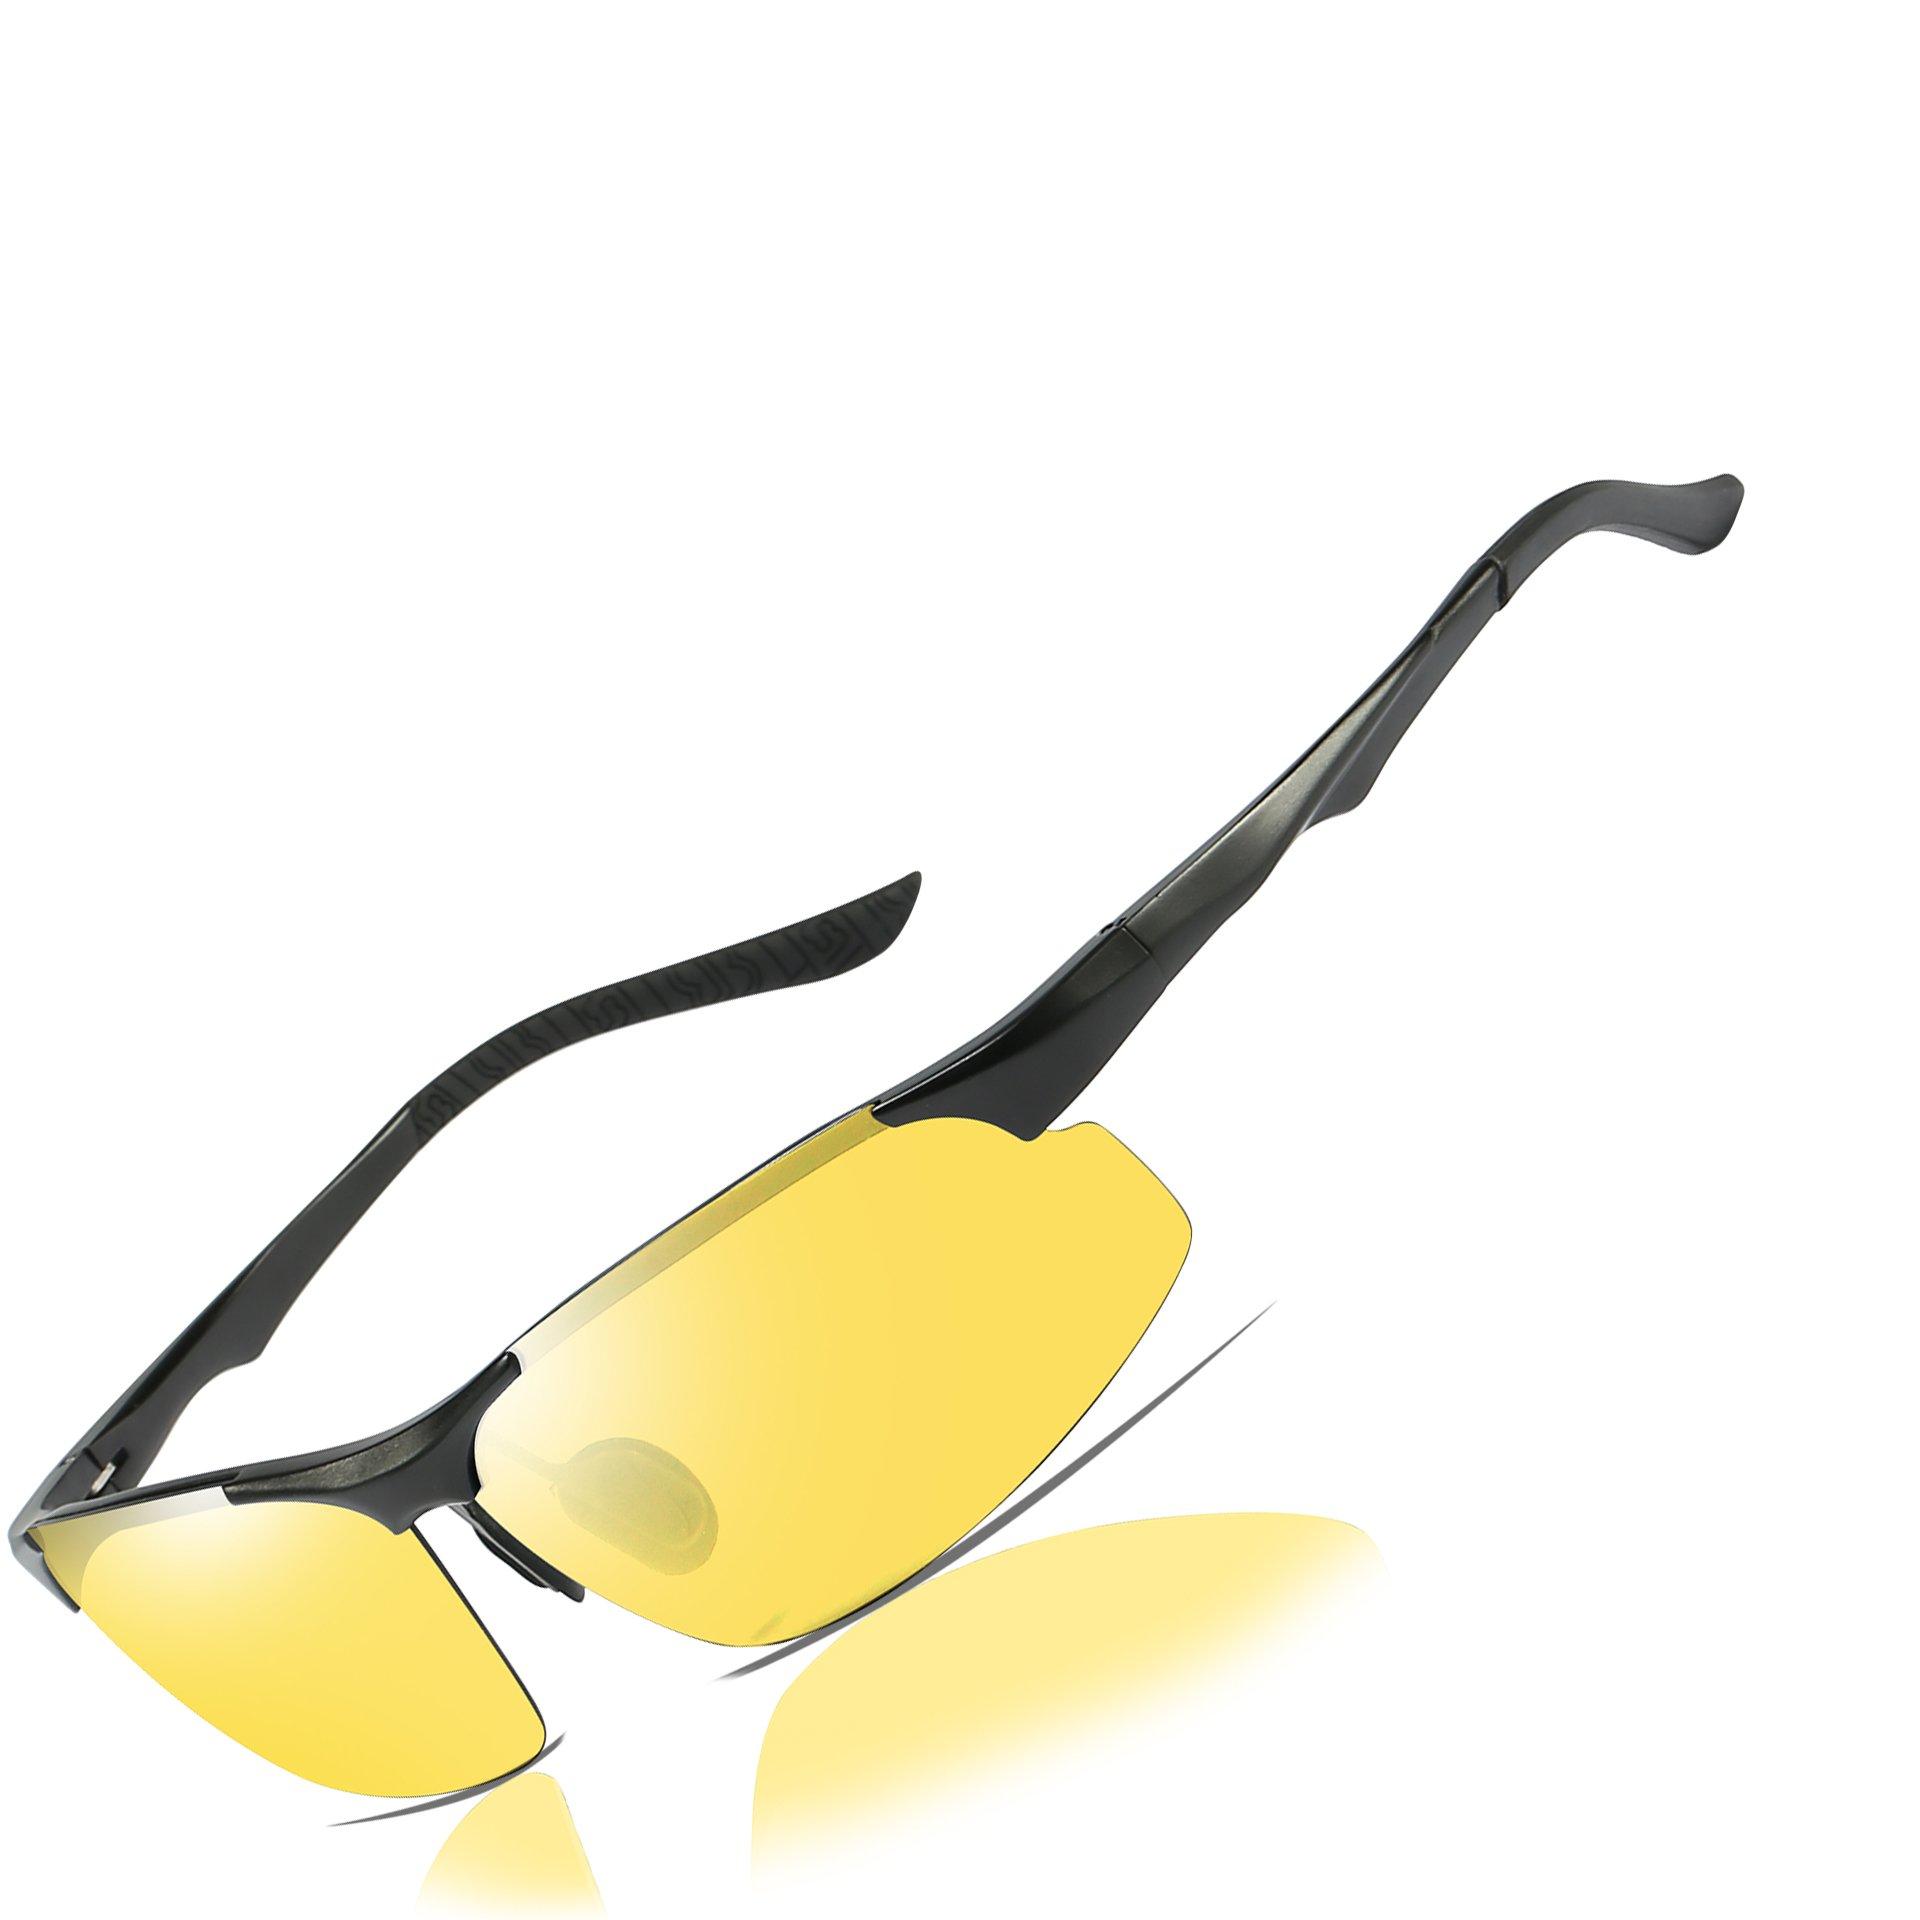 HD Night Vision Driving Polarized Glasses Anti-Glare Yellow Lens Mens forOutdoor